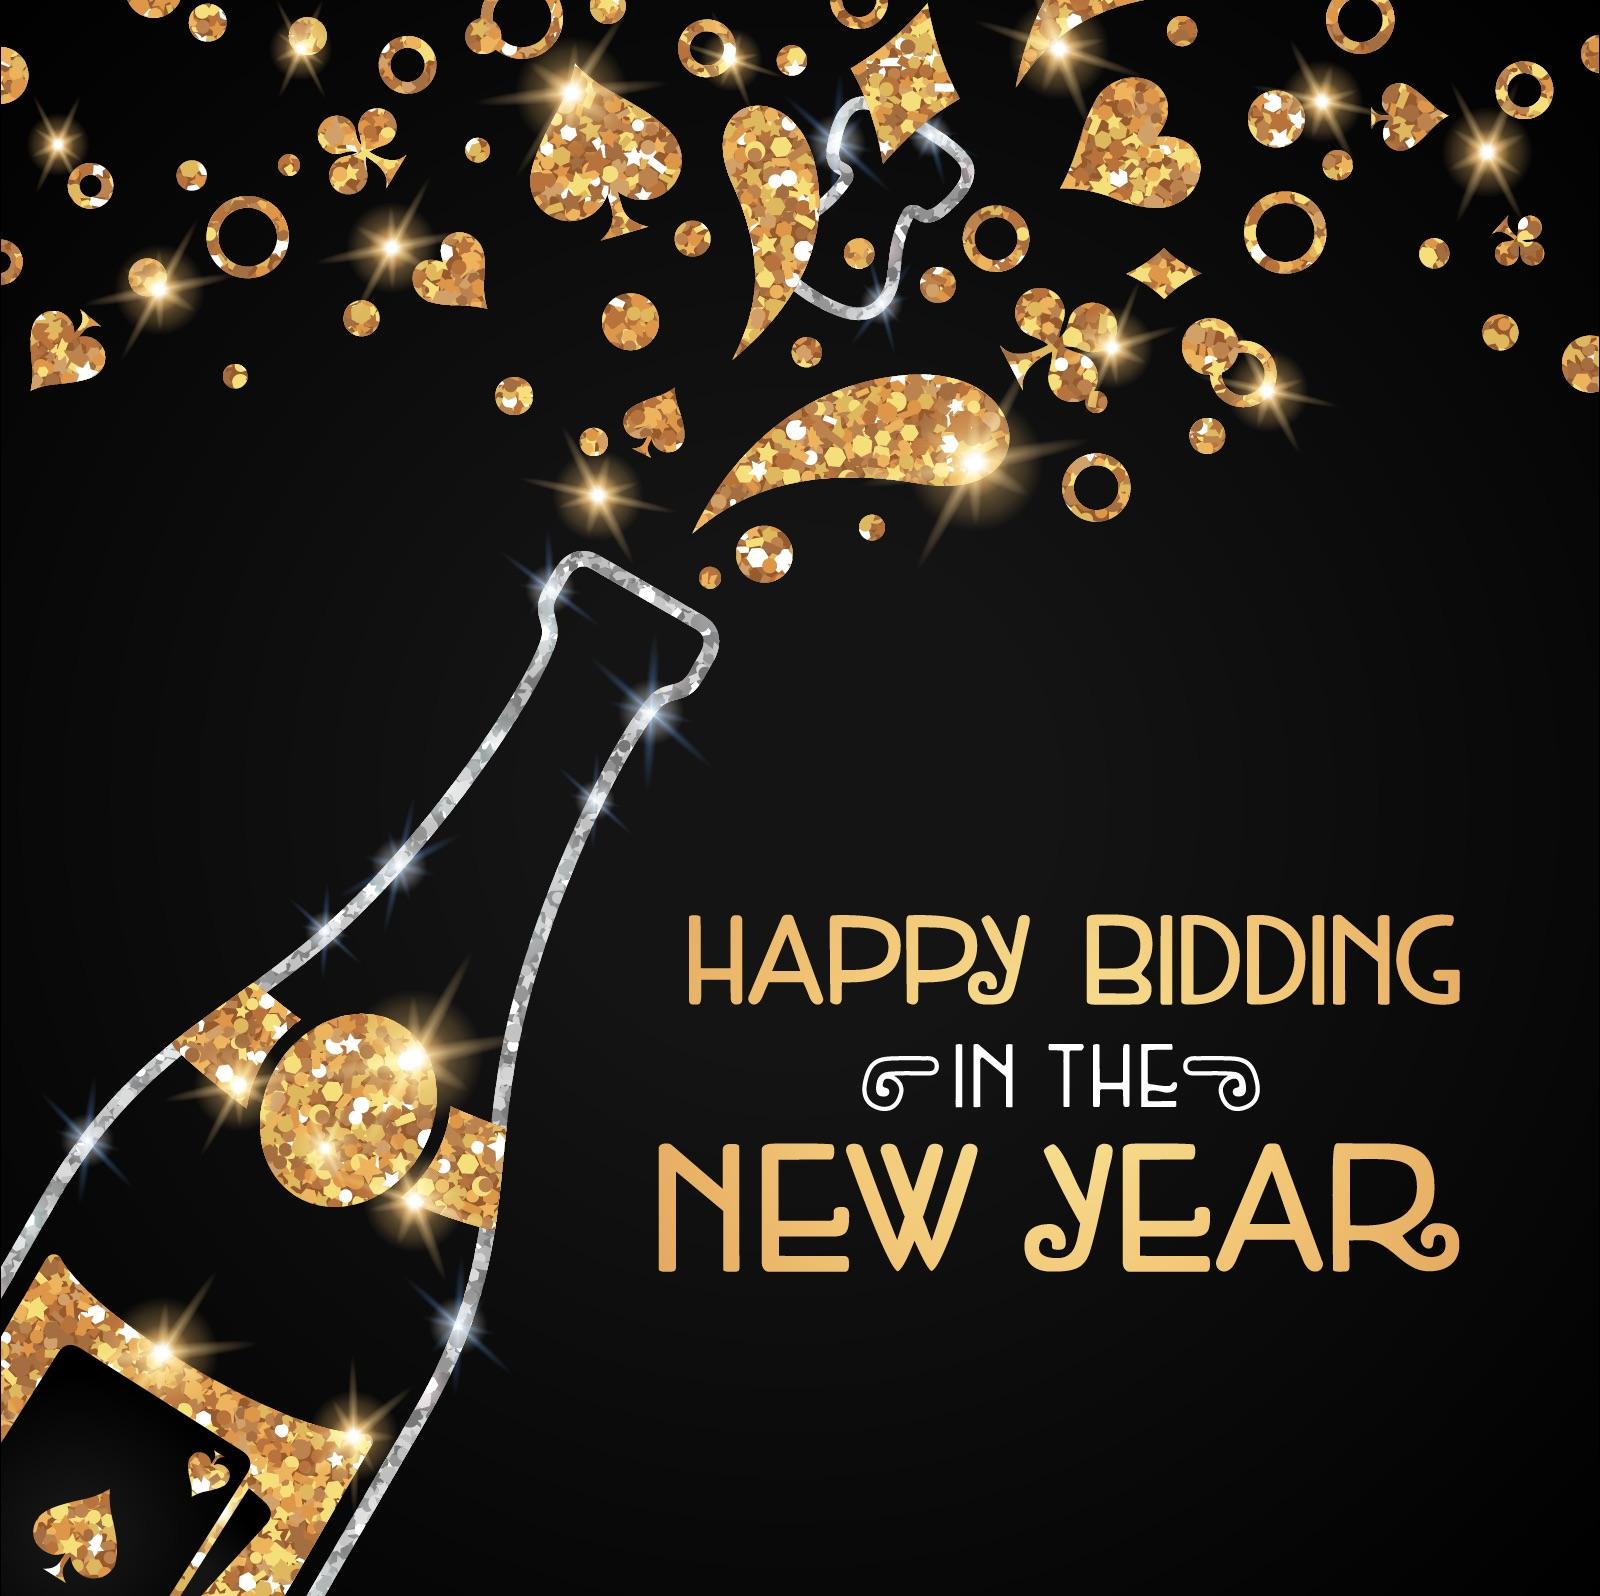 download new year clipart below downlad jpeg btnpng